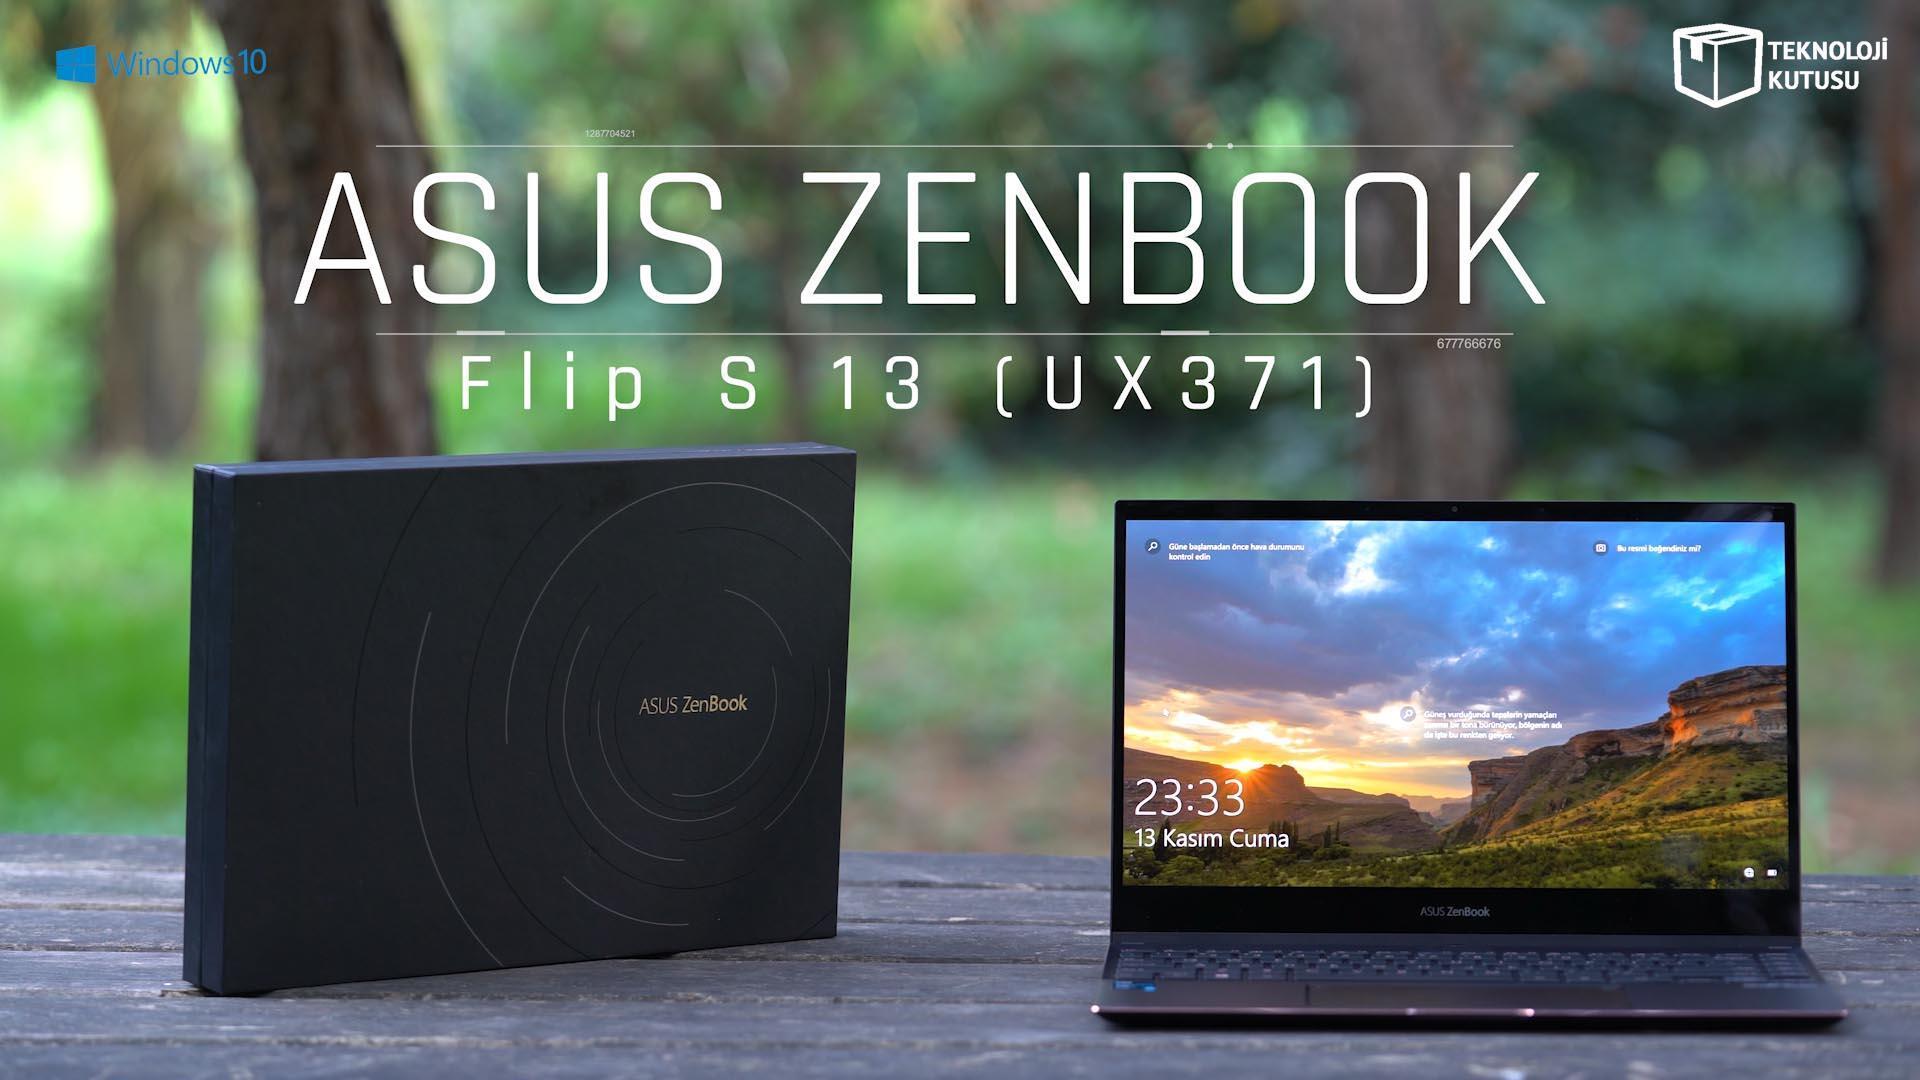 ASUS Zenbook Flip S 13 incelemesi